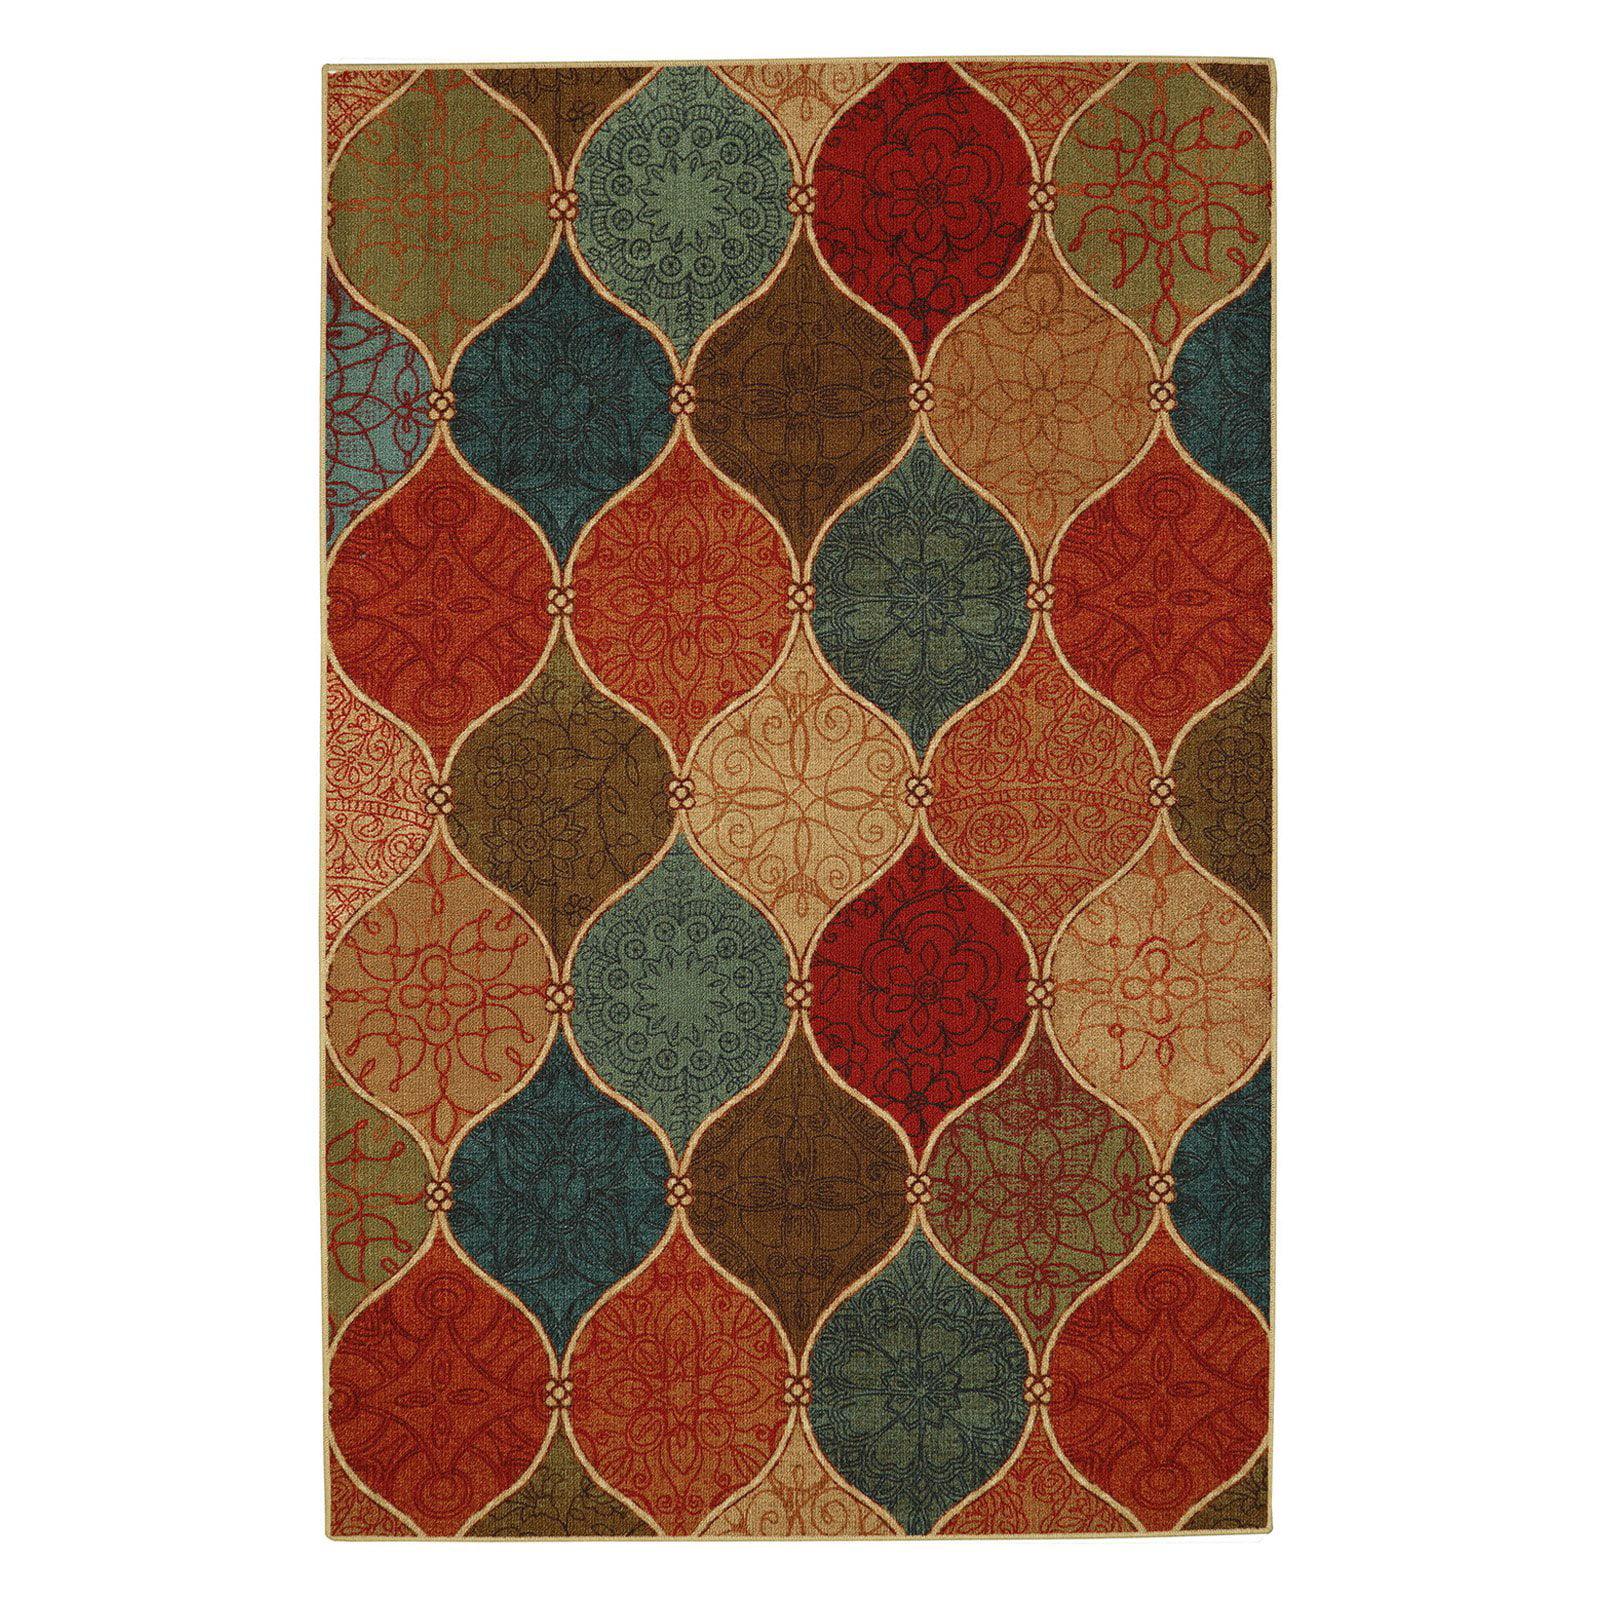 "Mohawk Soho Riza Tile Fret Multi Area Rug (7' 6""x10') by Mohawk Home"